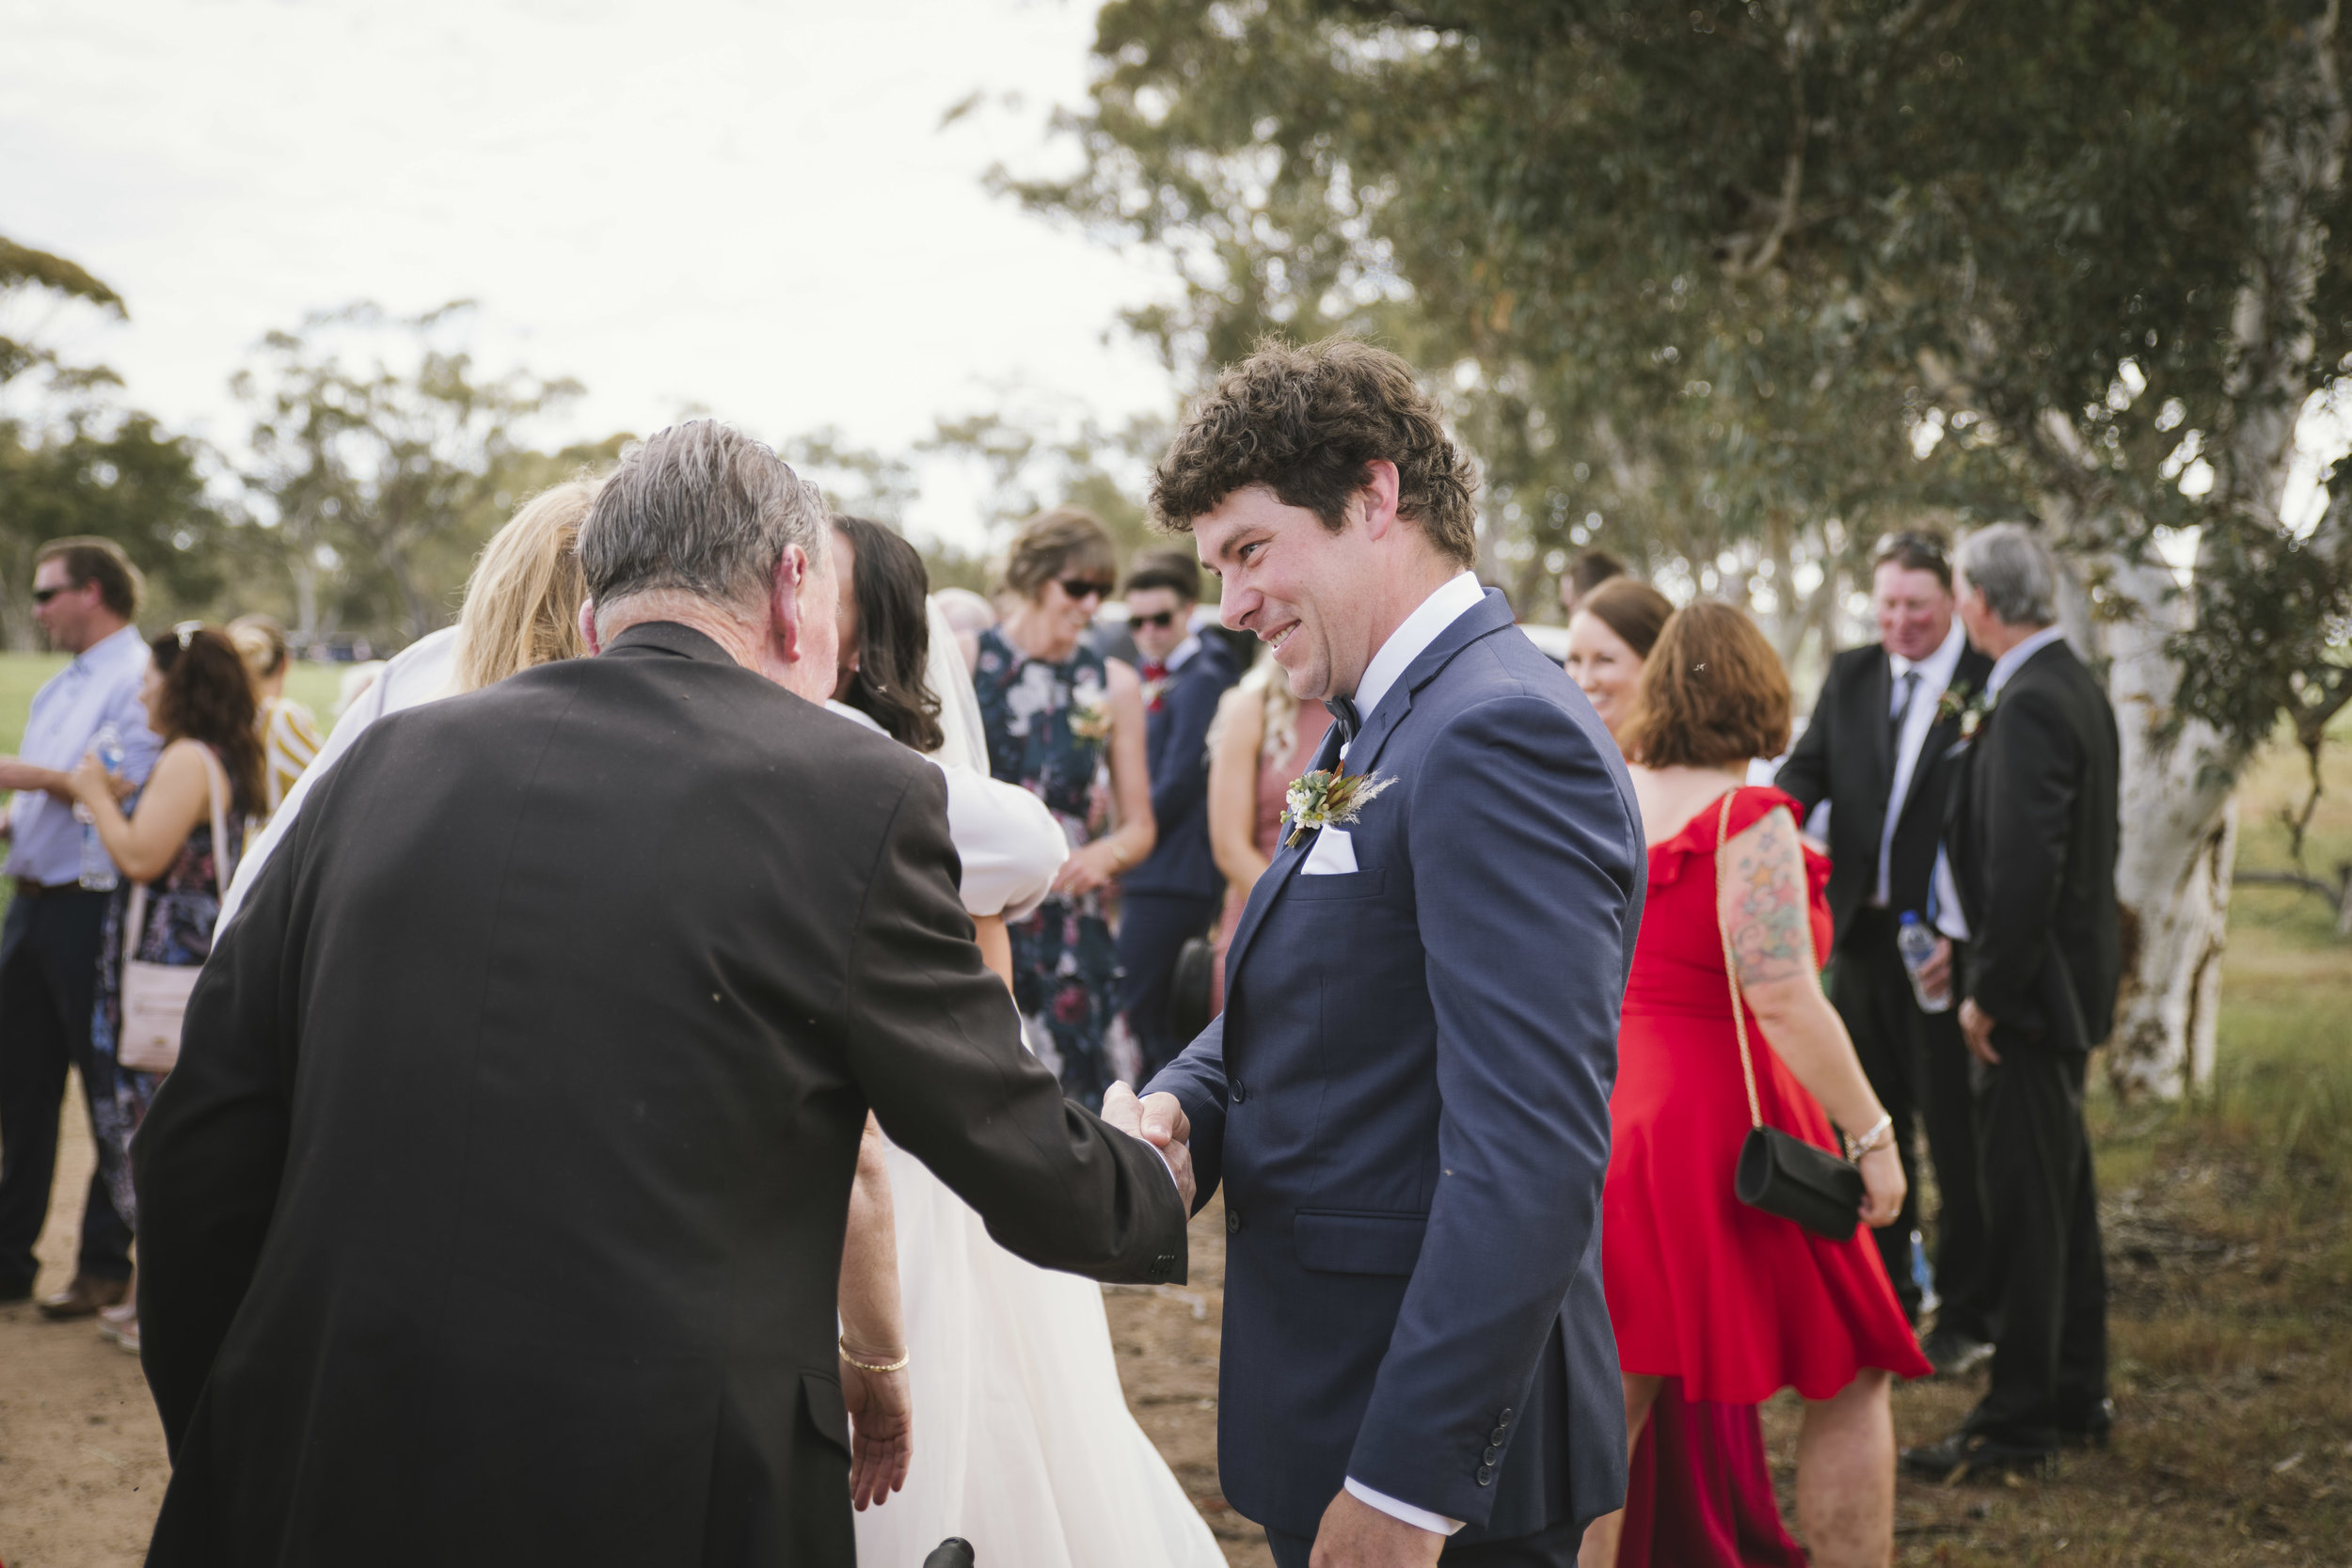 Angie Roe Photography Wheatbelt Avon Valley Farm Wedding (28).jpg